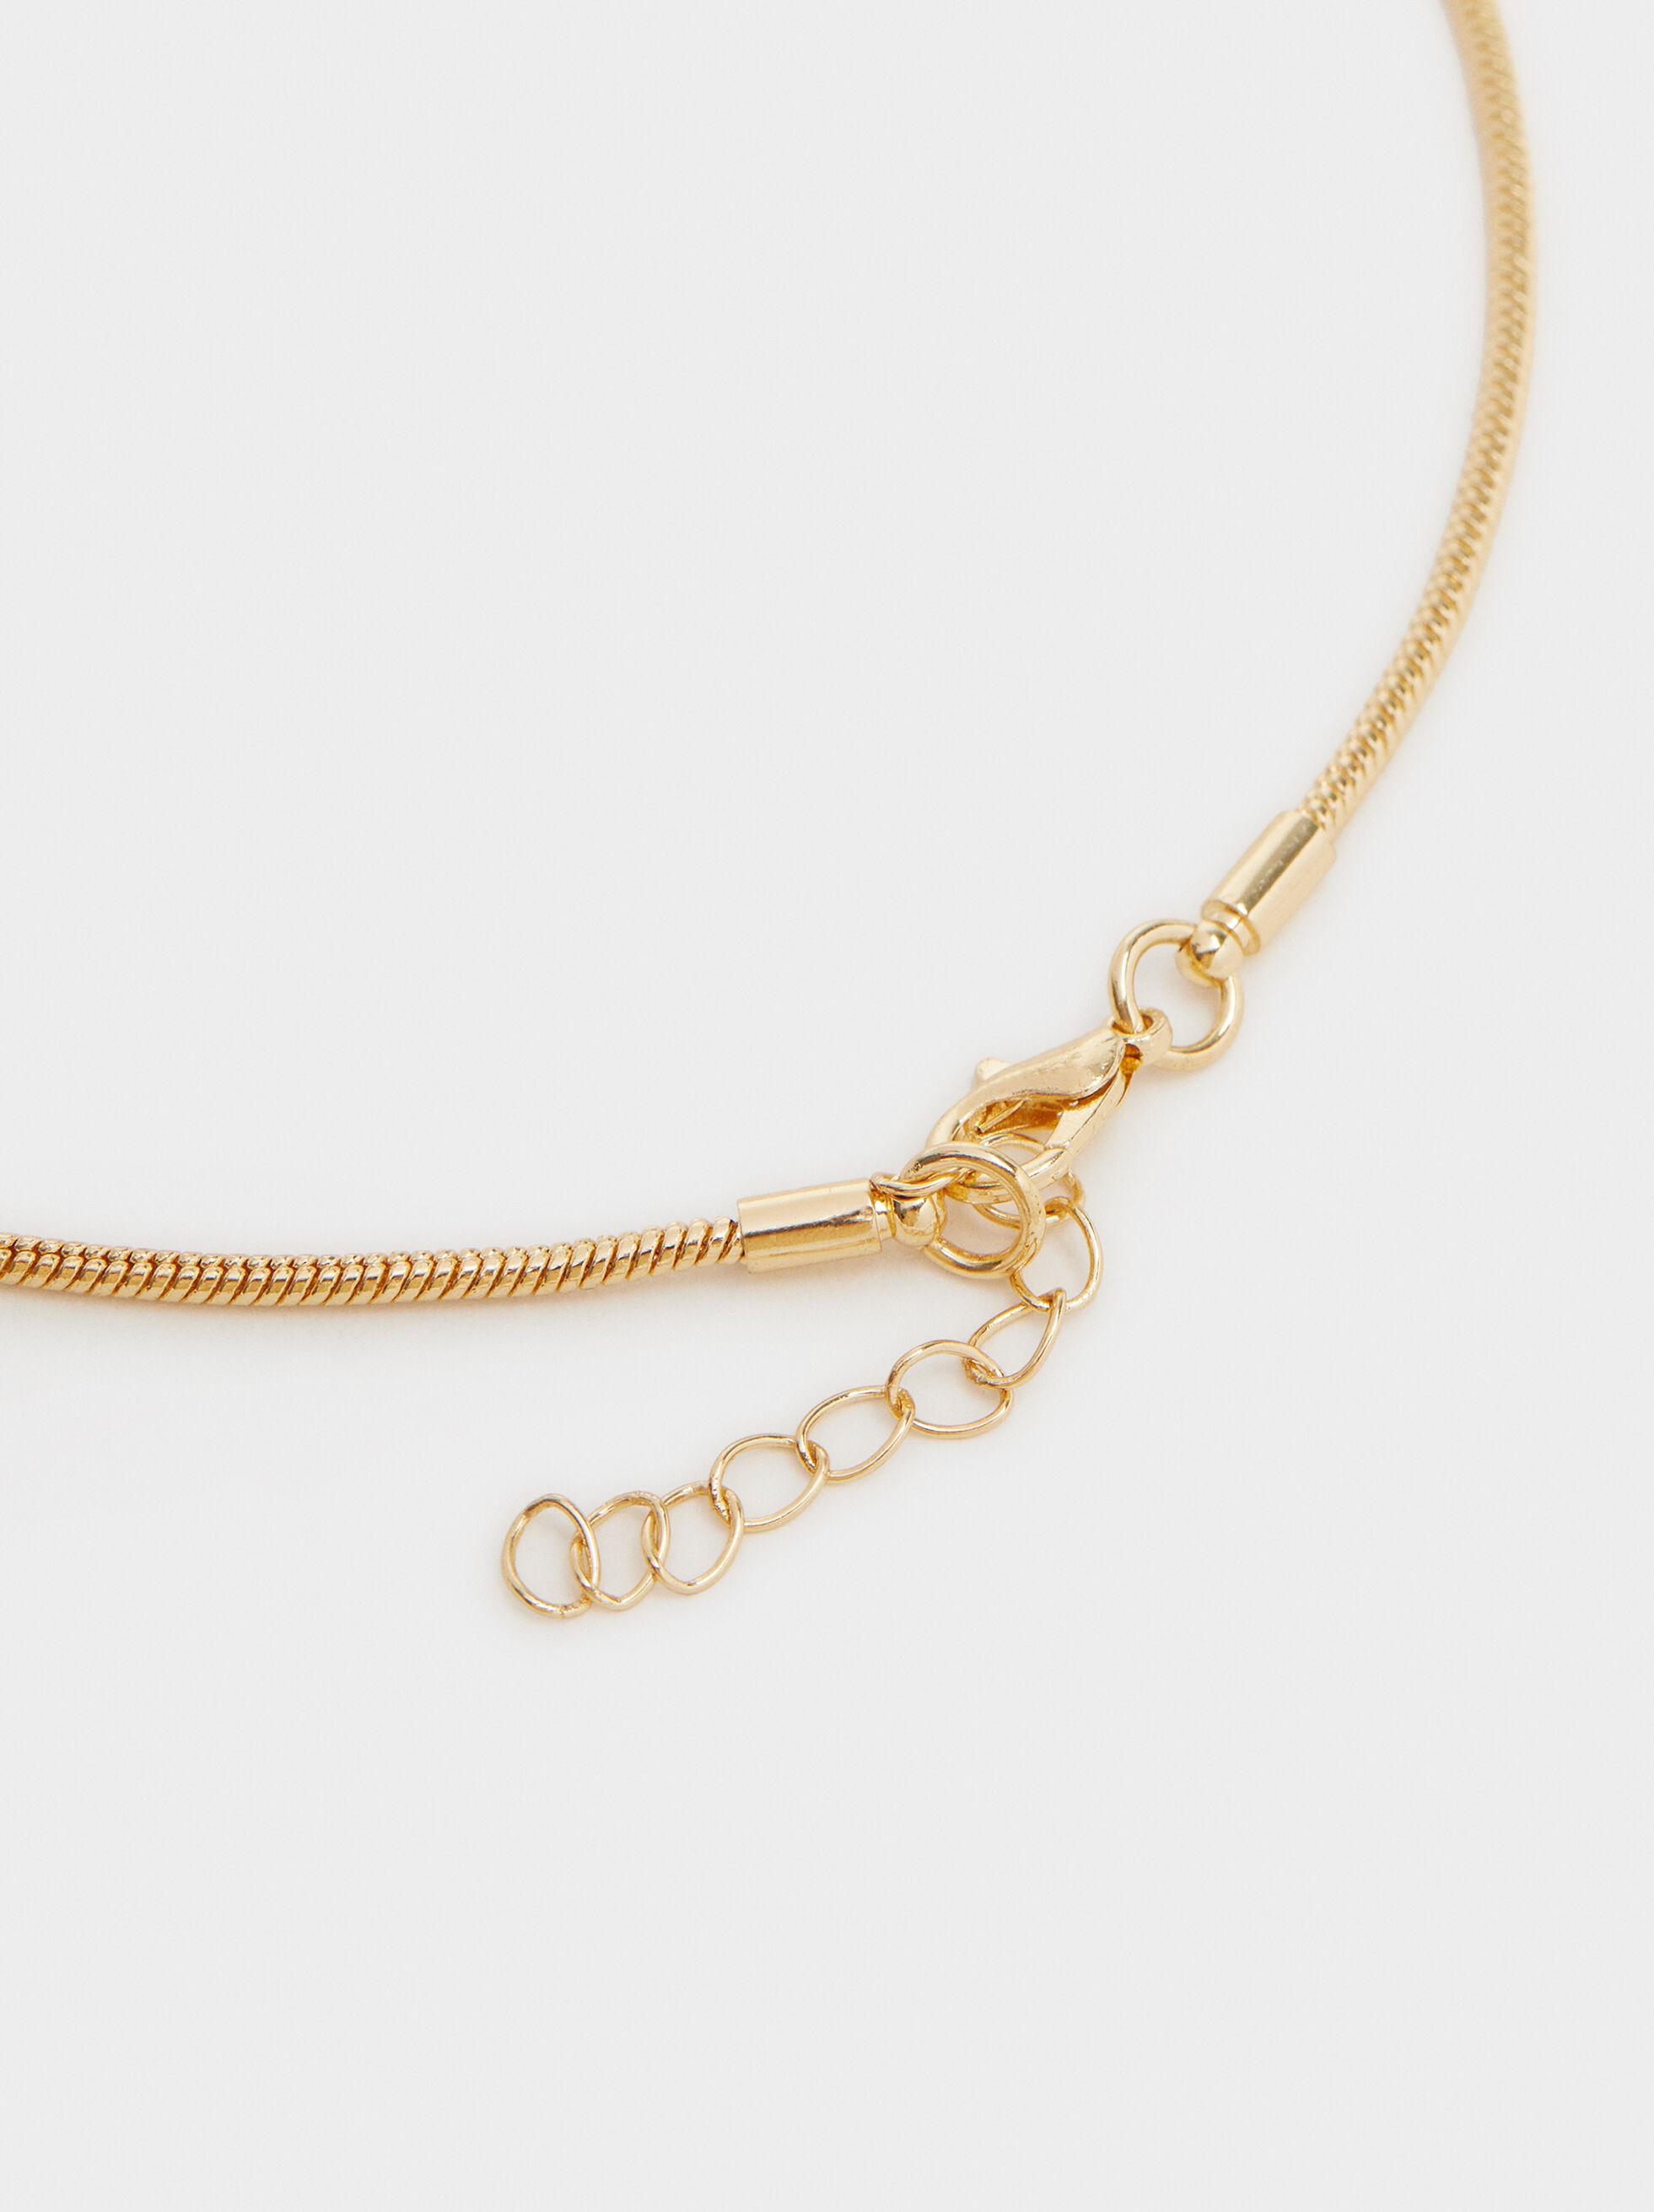 Bubbles Short Necklace, Multicolor, hi-res